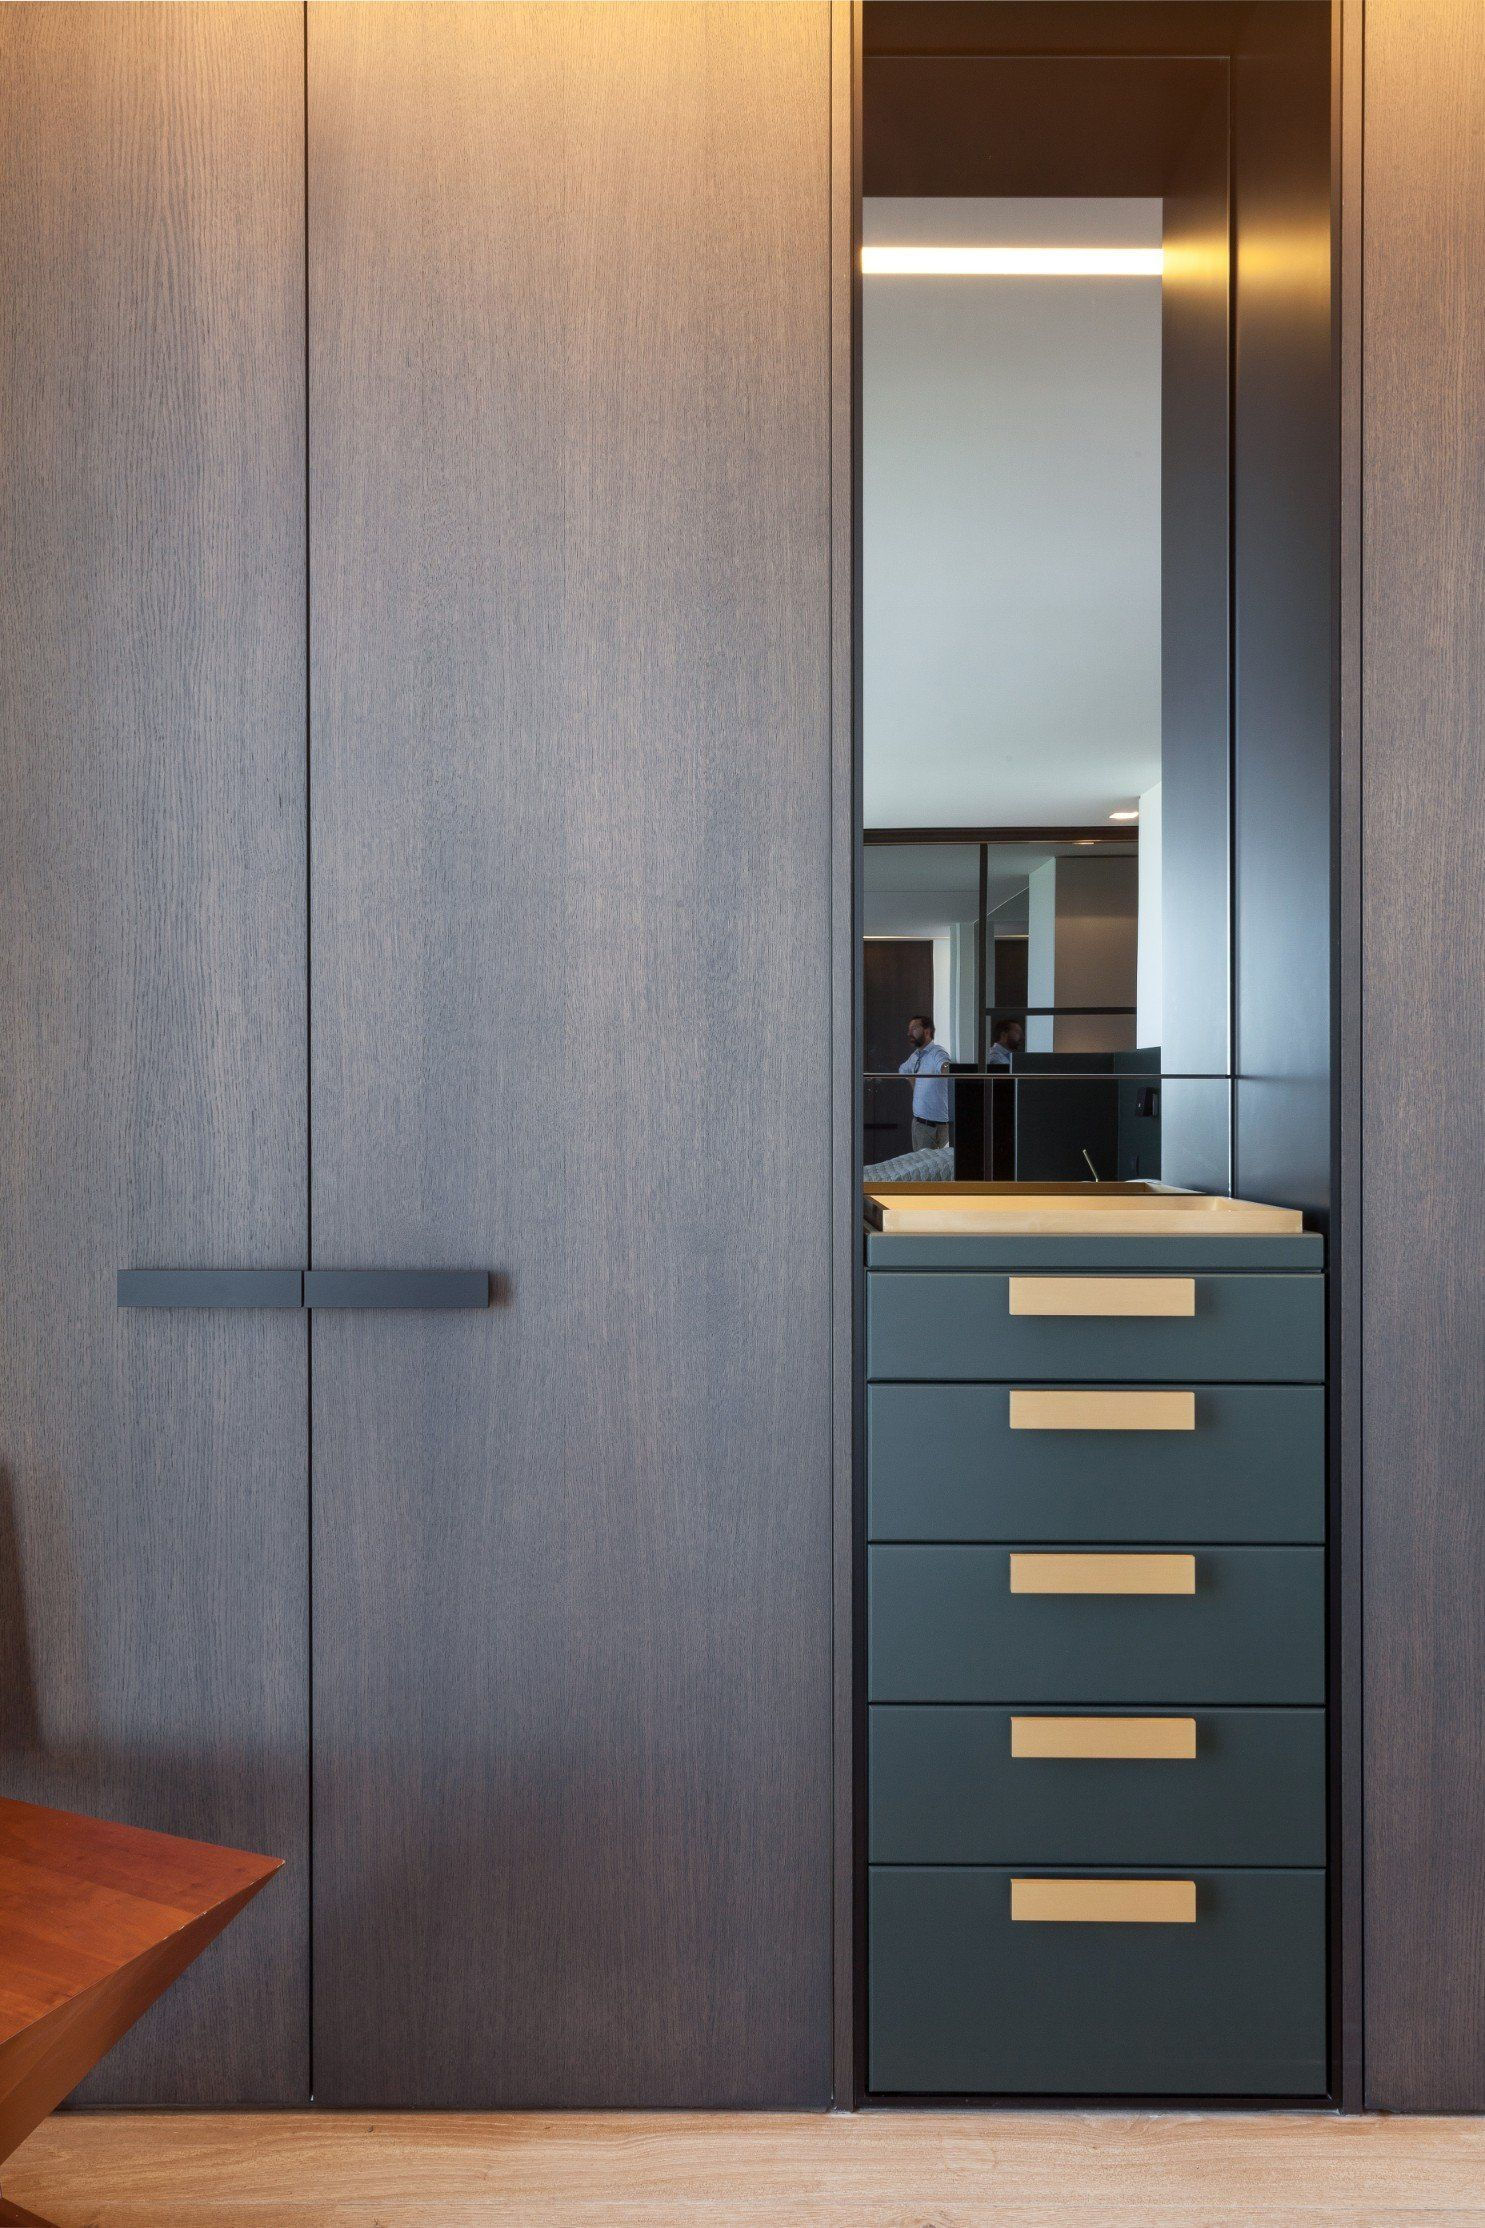 20 Chic Wardrobe Design Ideas For Your Small Bedroom In 2020 Cupboard Design Wardrobe Design Bedroom Wardrobe Door Designs